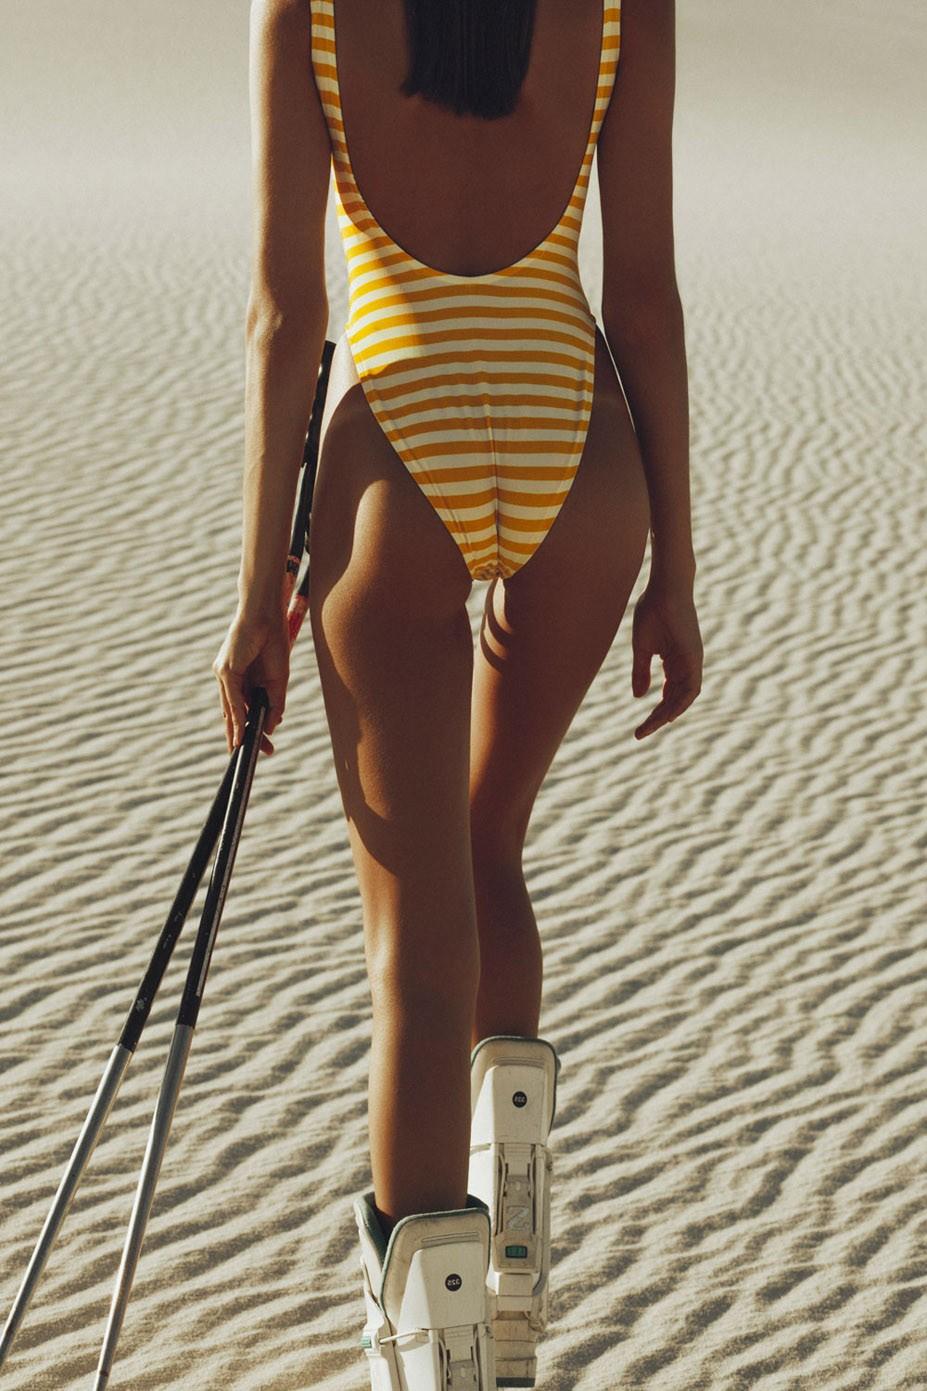 На лыжах по песчаным дюнам - Рафаэлла Консентино / Rafaella Consentino by Sven Kristian - Vallee de atlantis